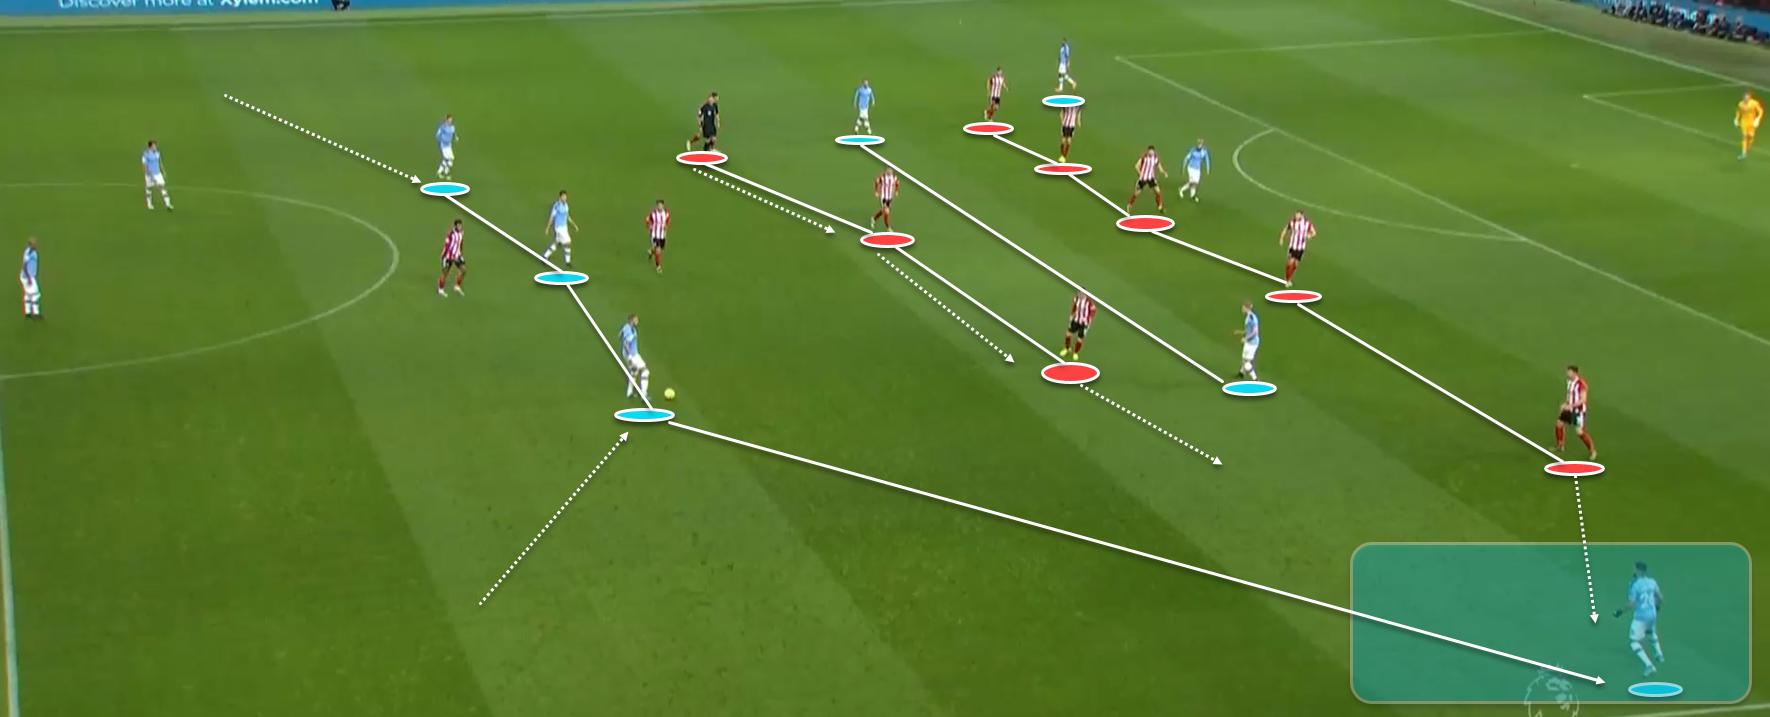 Premier League 2019/20: Manchester City vs Sheffield United - tactical analysis tactics